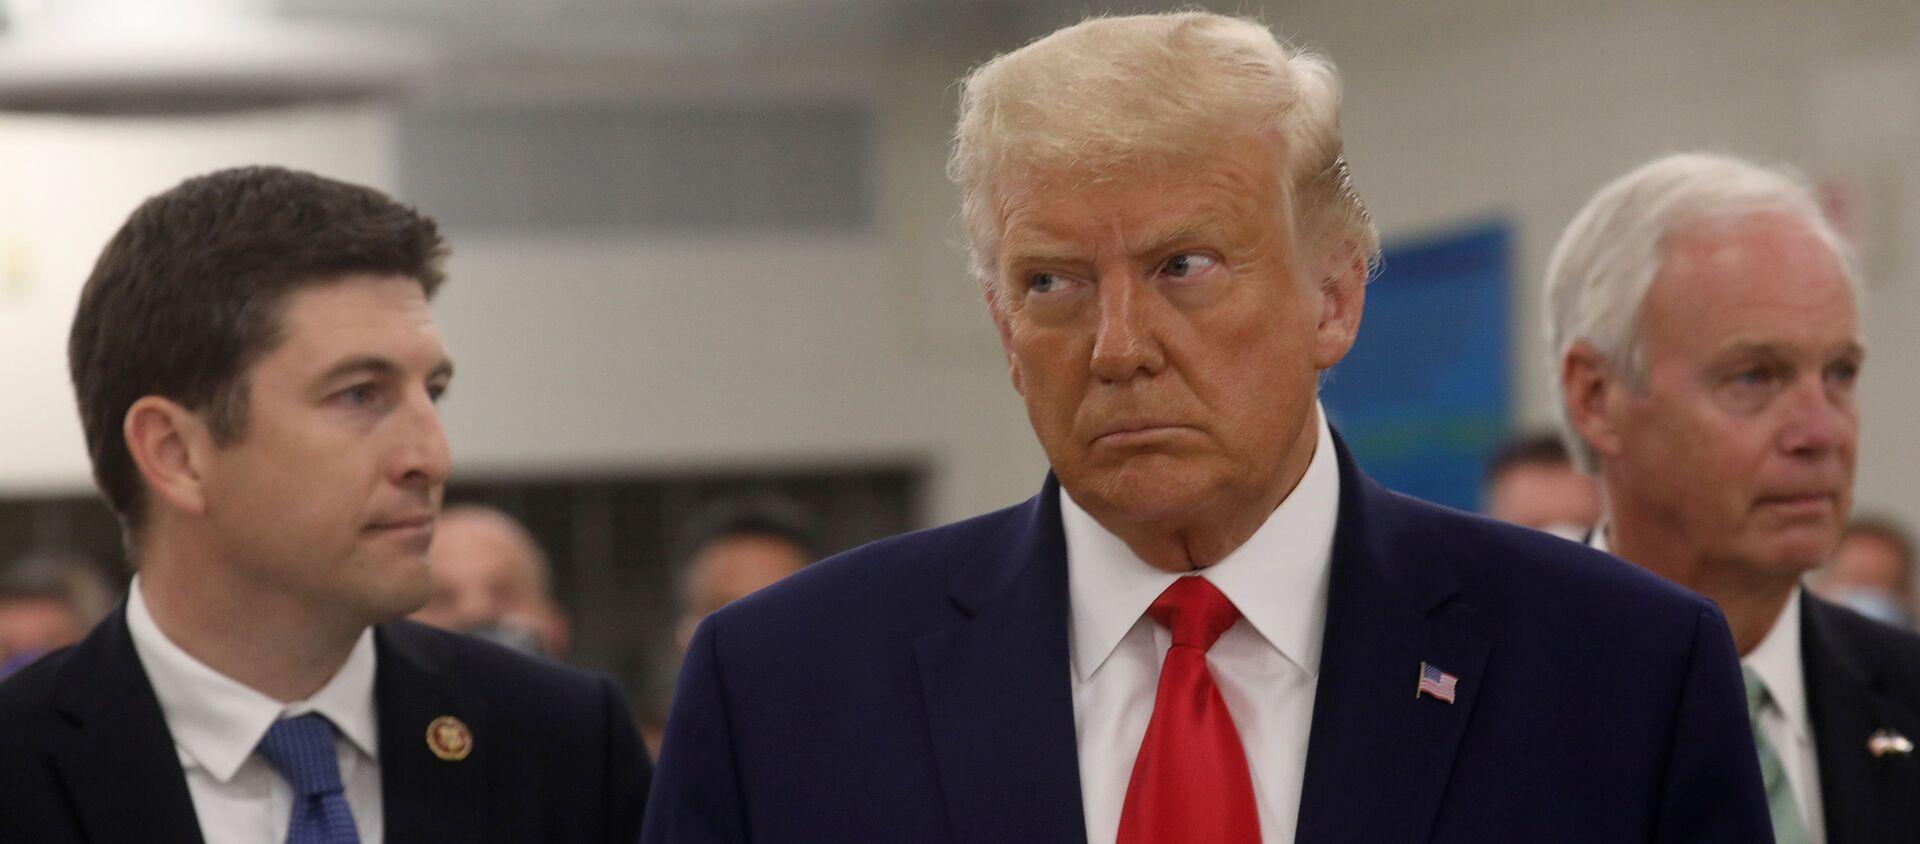 Tổng thống Hoa Kỳ Donald Trump - Sputnik Việt Nam, 1920, 07.10.2020